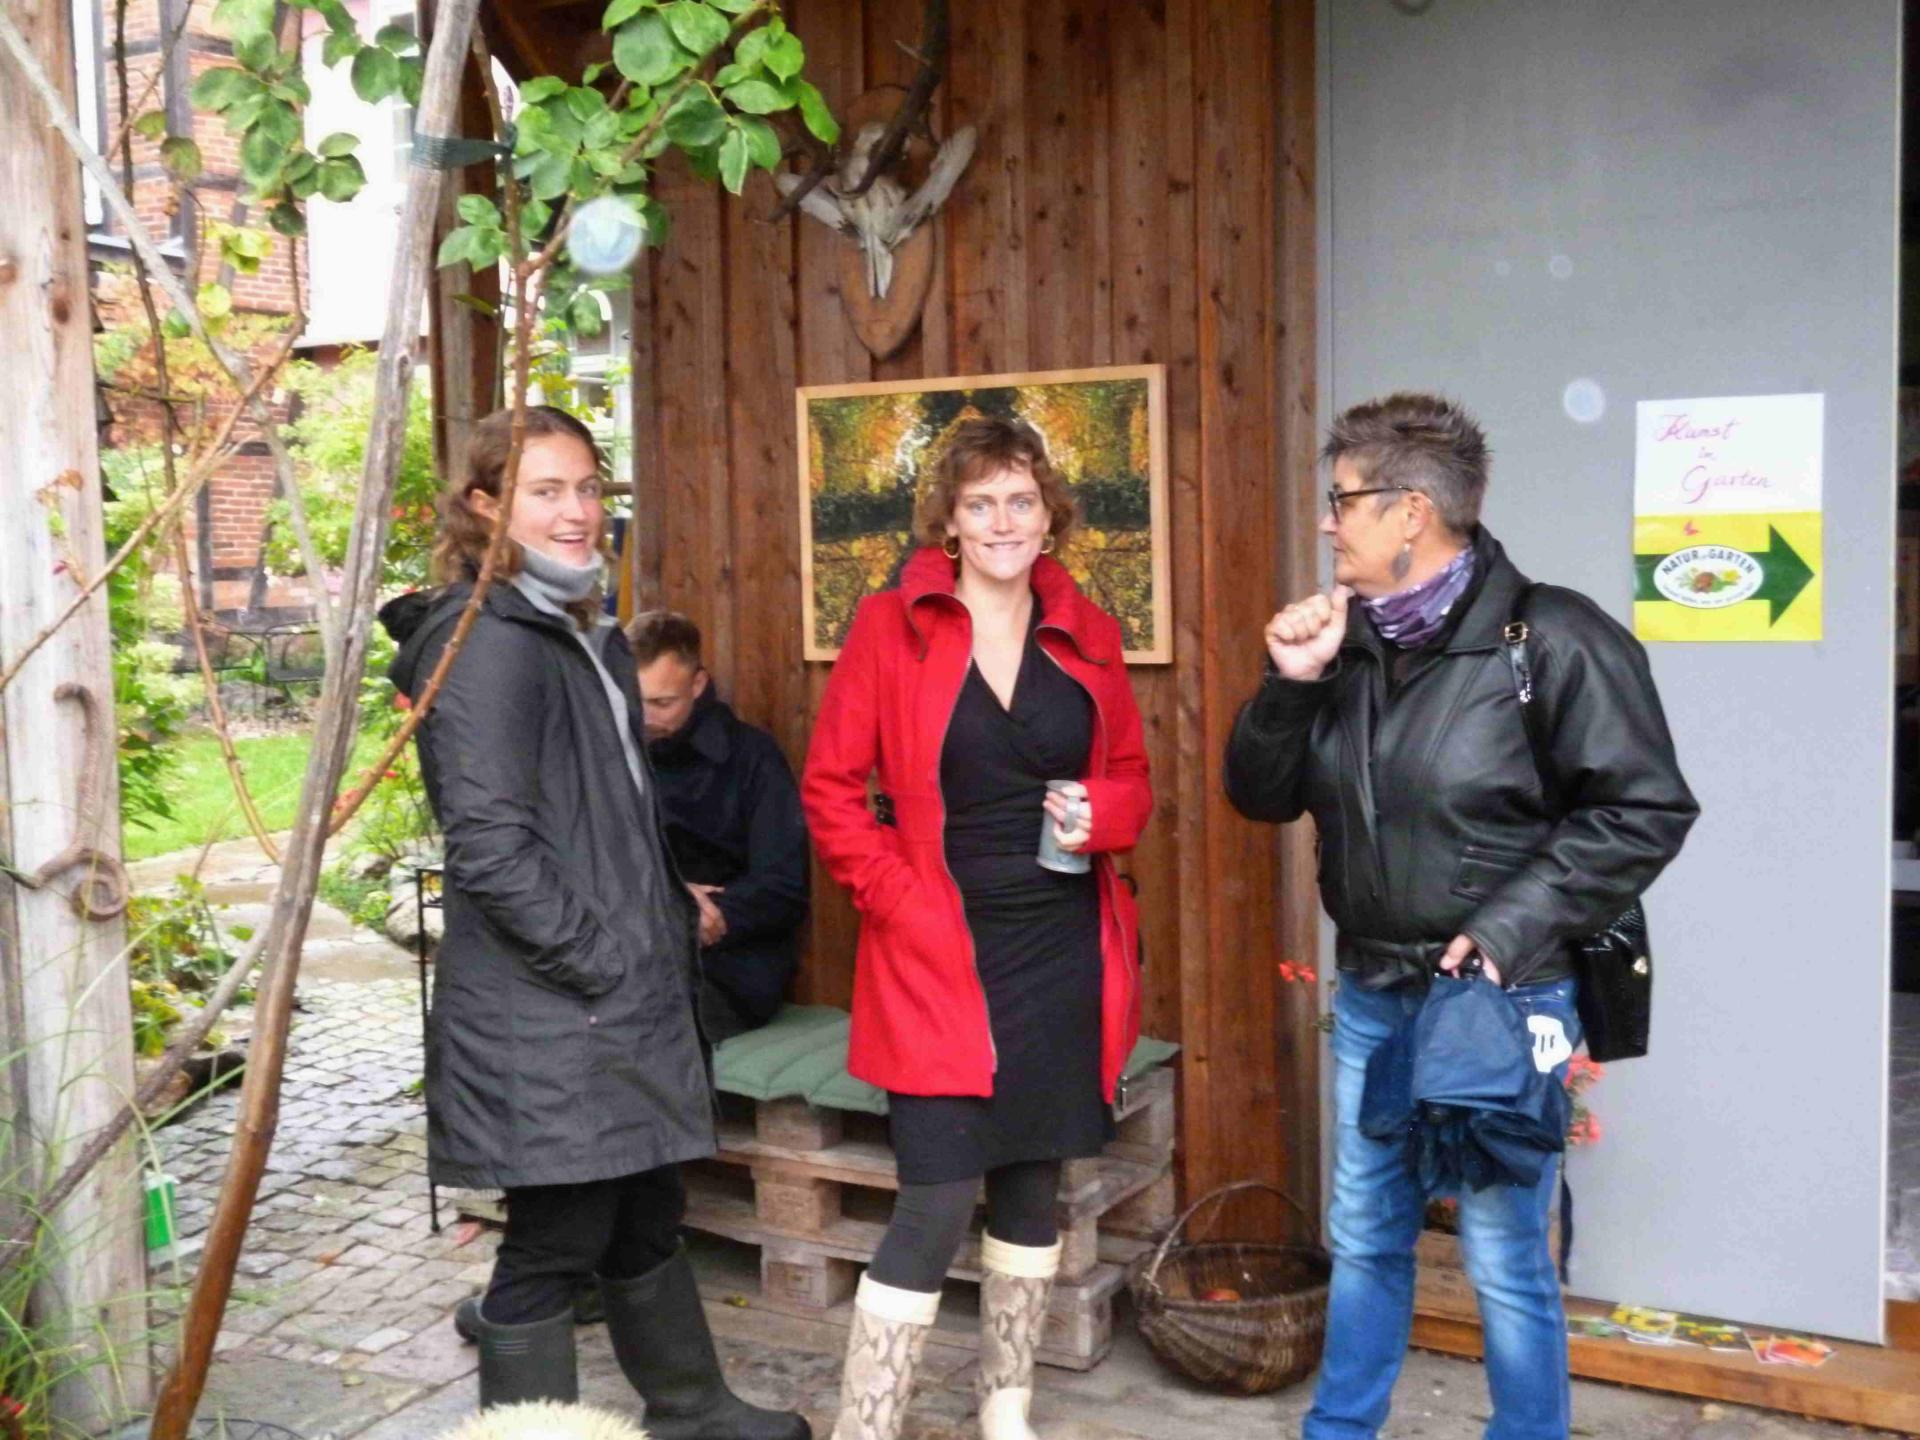 Offene Gartenpfporte 26-09-2020 Bild 03